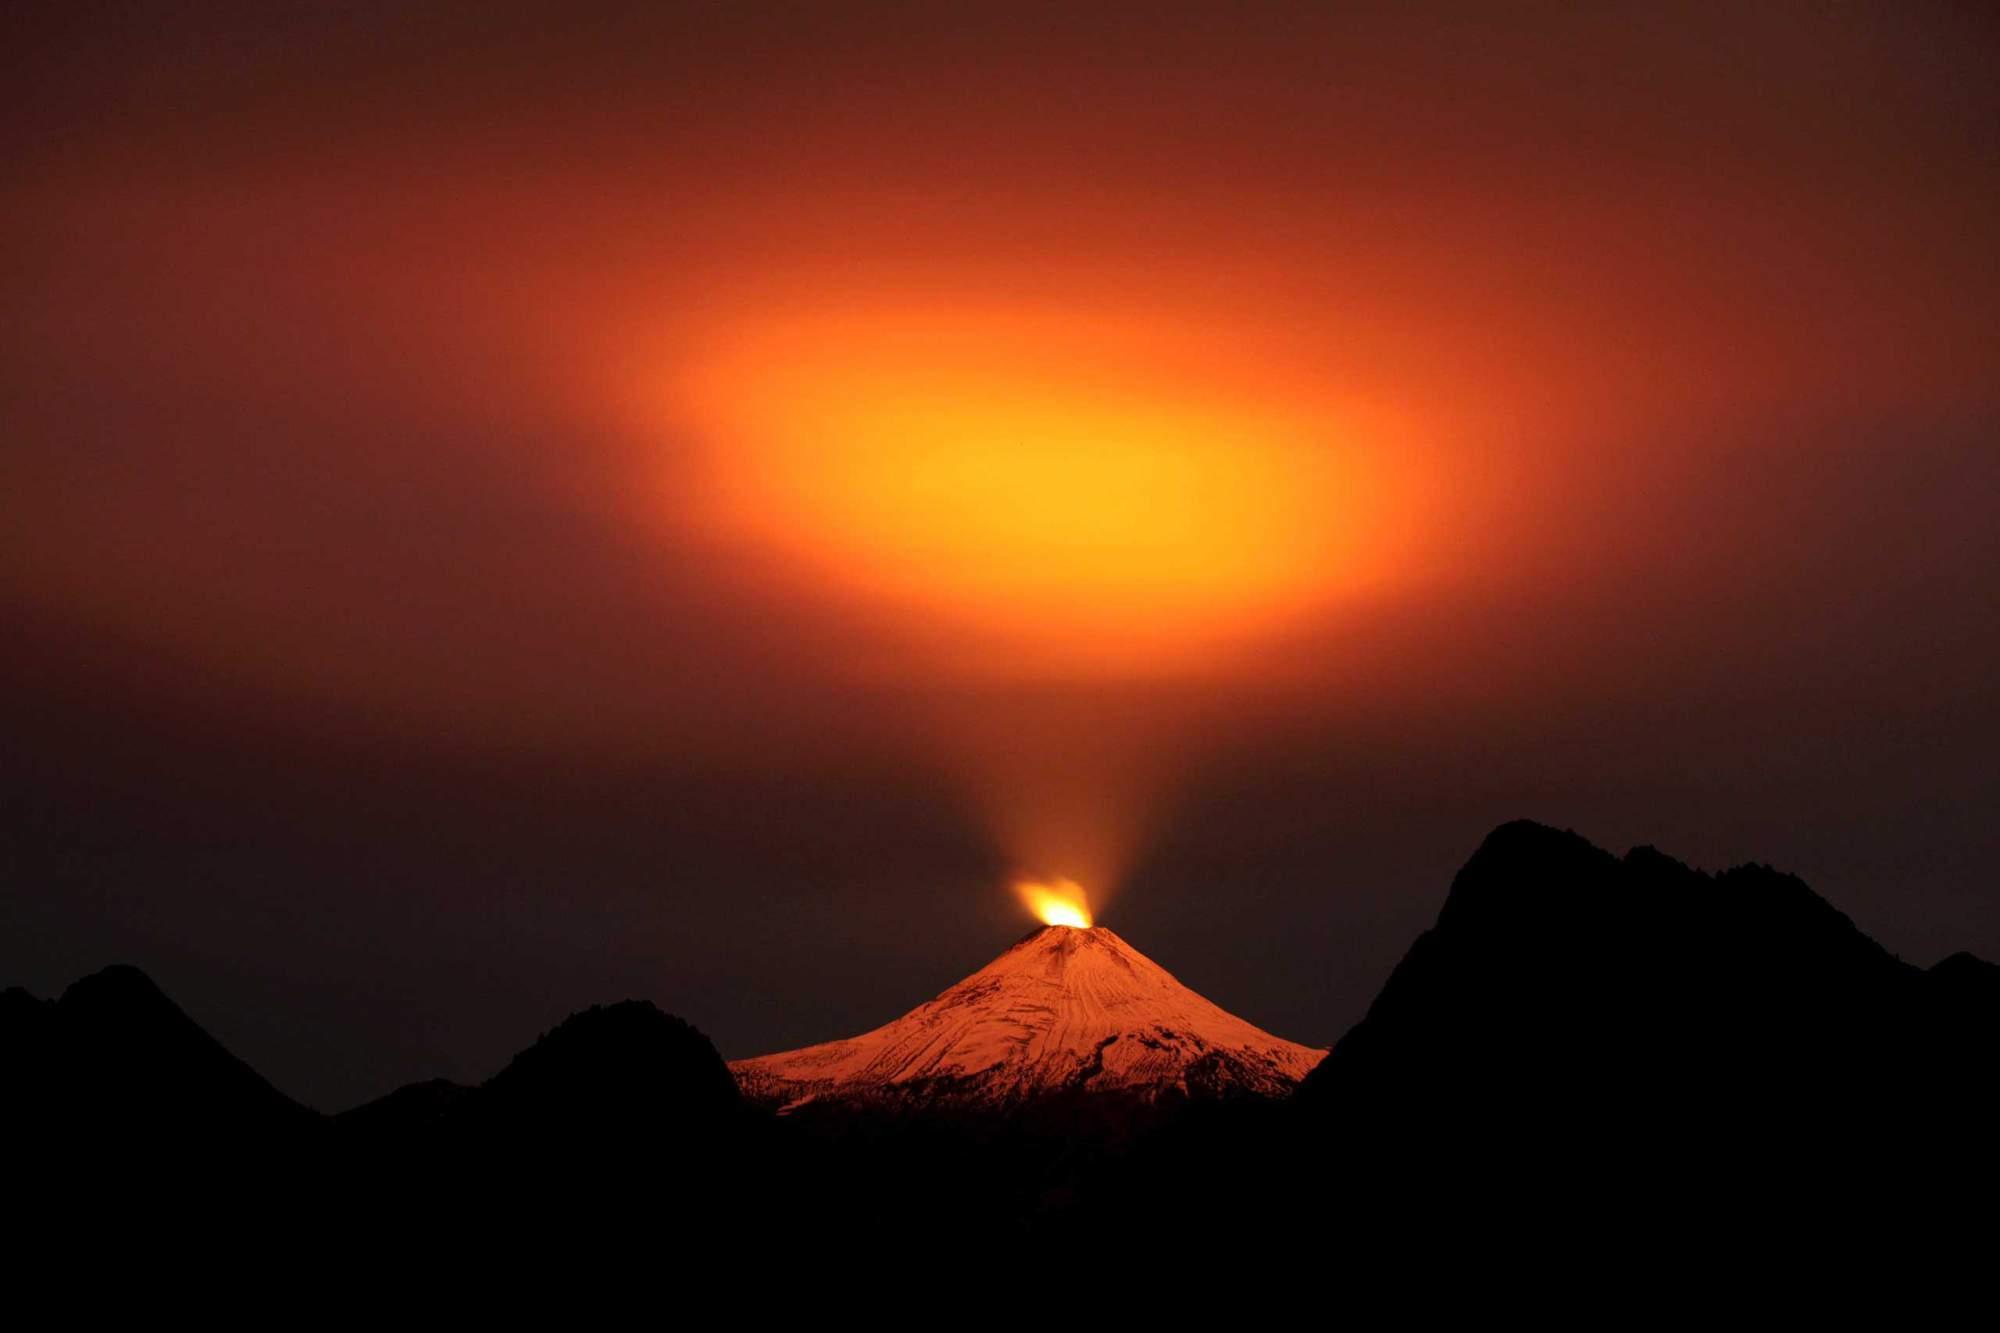 Villarrica Volcano, The Villarrica volcano creates a magic portal in the night sky over Pucon., Villarrica Volcano photo, best Villarrica Volcano photo 2015, Villarrica Volcano portal, Villarrica Volcano portal to heaven, Villarrica Volcano light sky, Villarrica Volcano lights up sky over Pucon